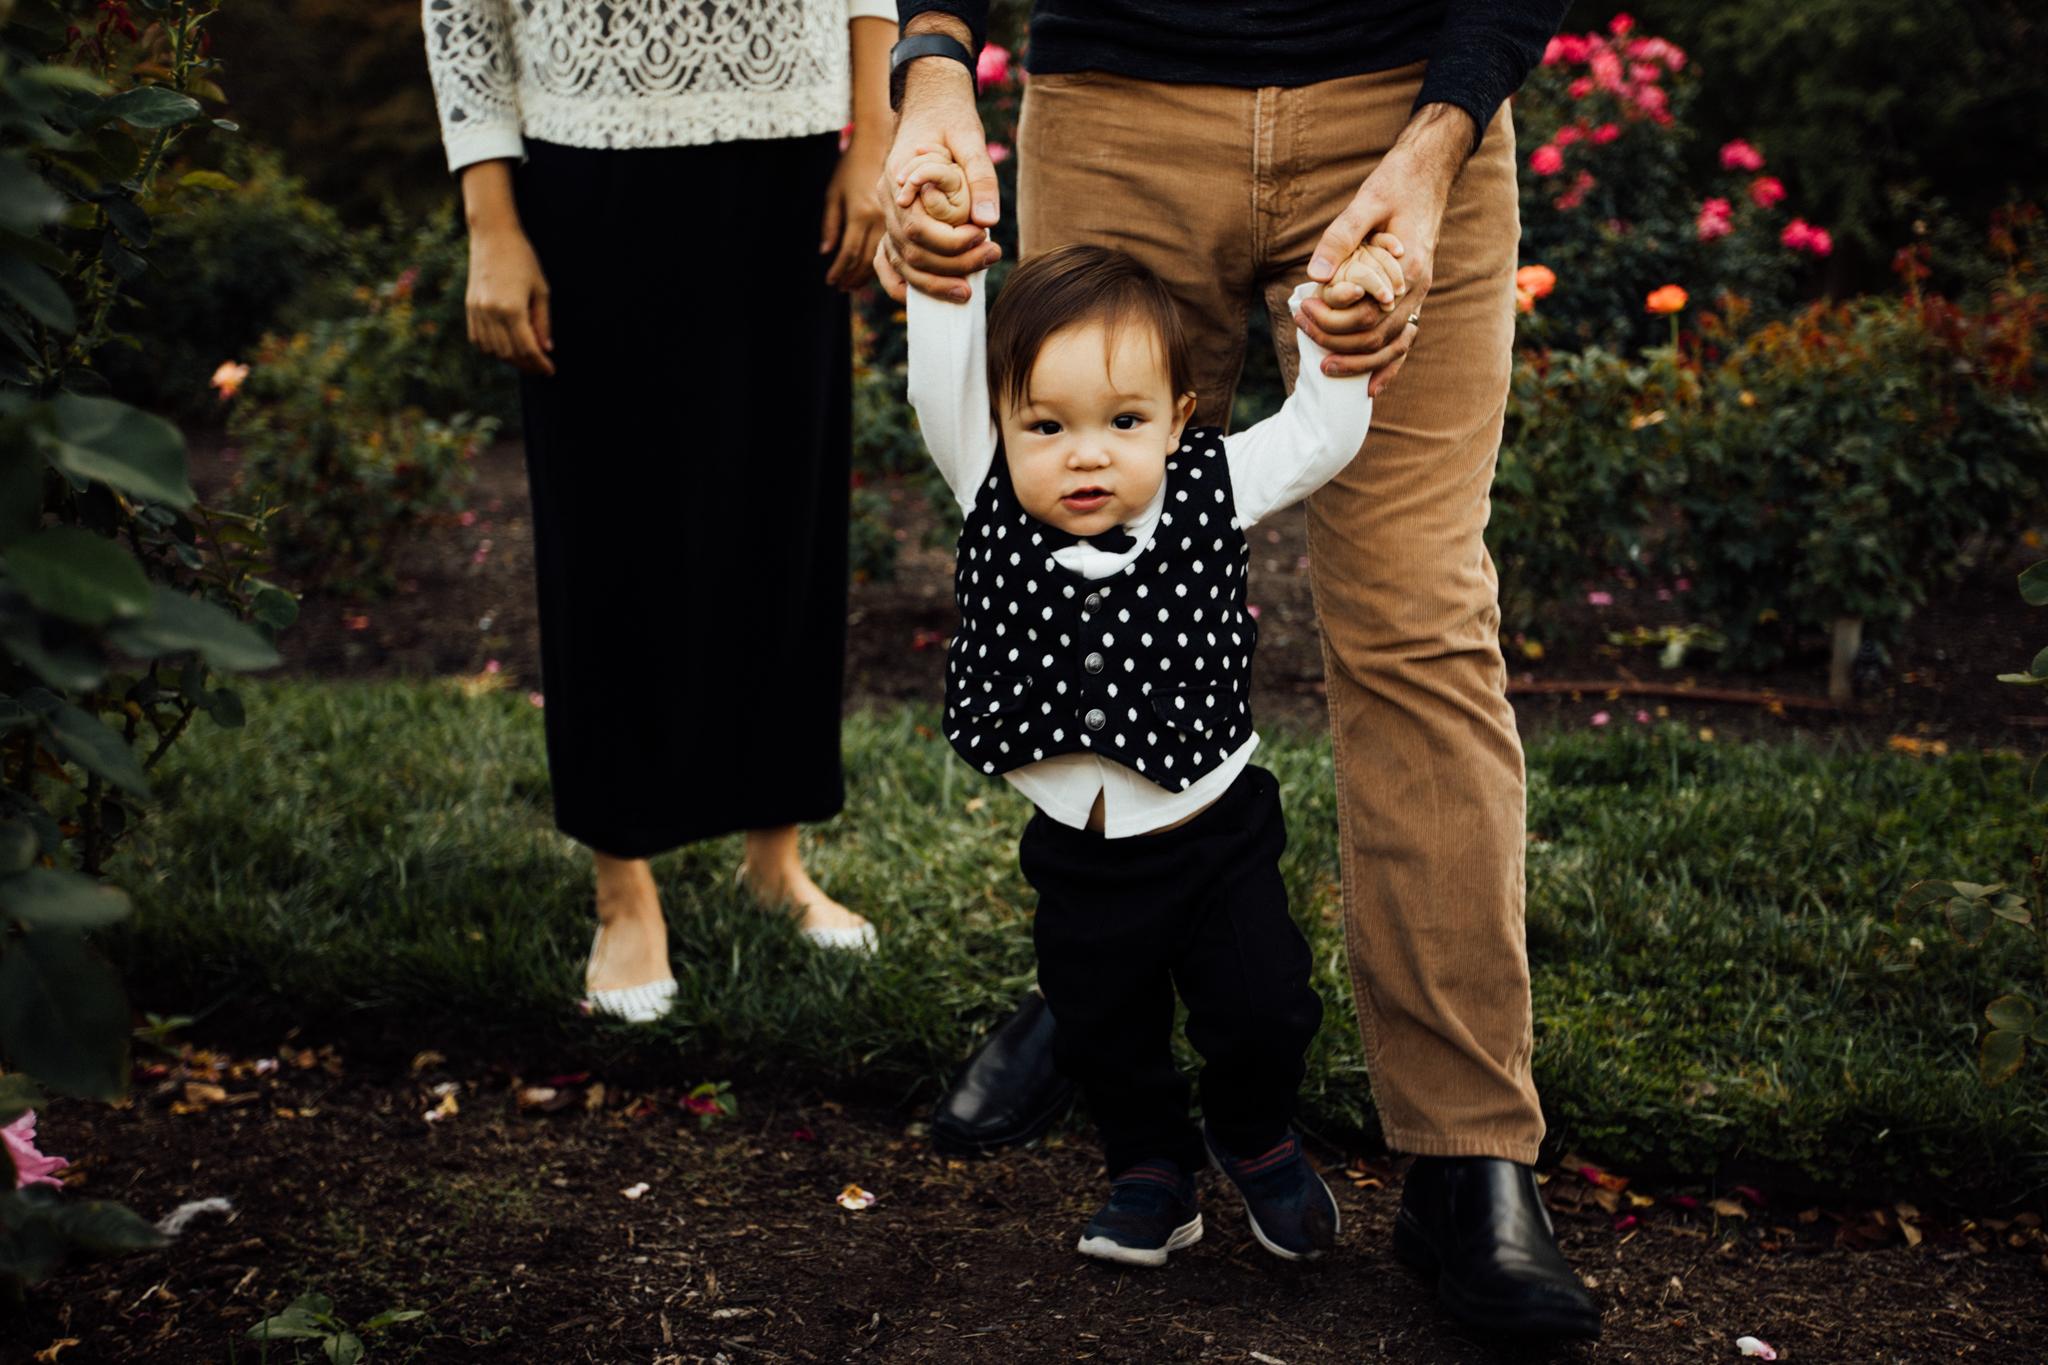 Toddler walks holding dad's hands Madison and Huntsville Alabama family photographer Rachel K Photo